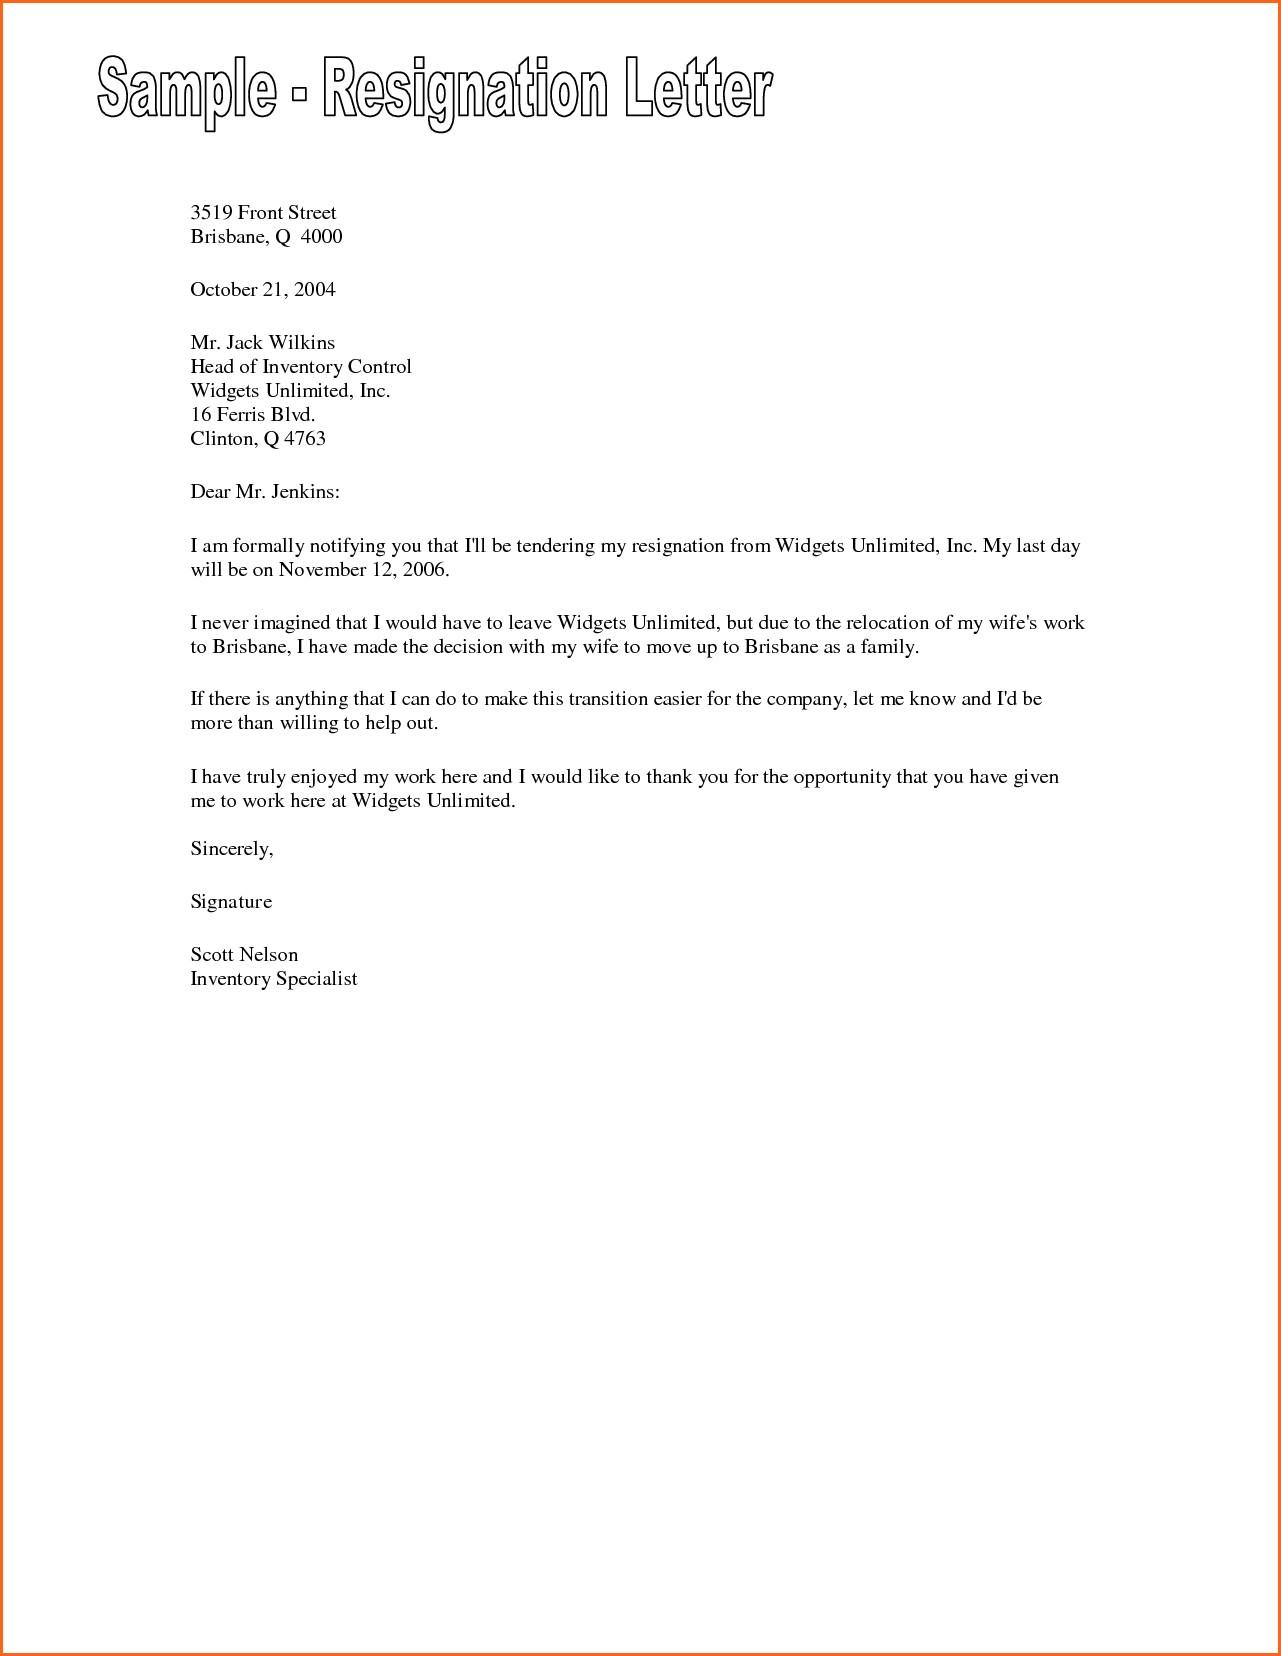 Retirement Letter to Employer Template Samples  Letter